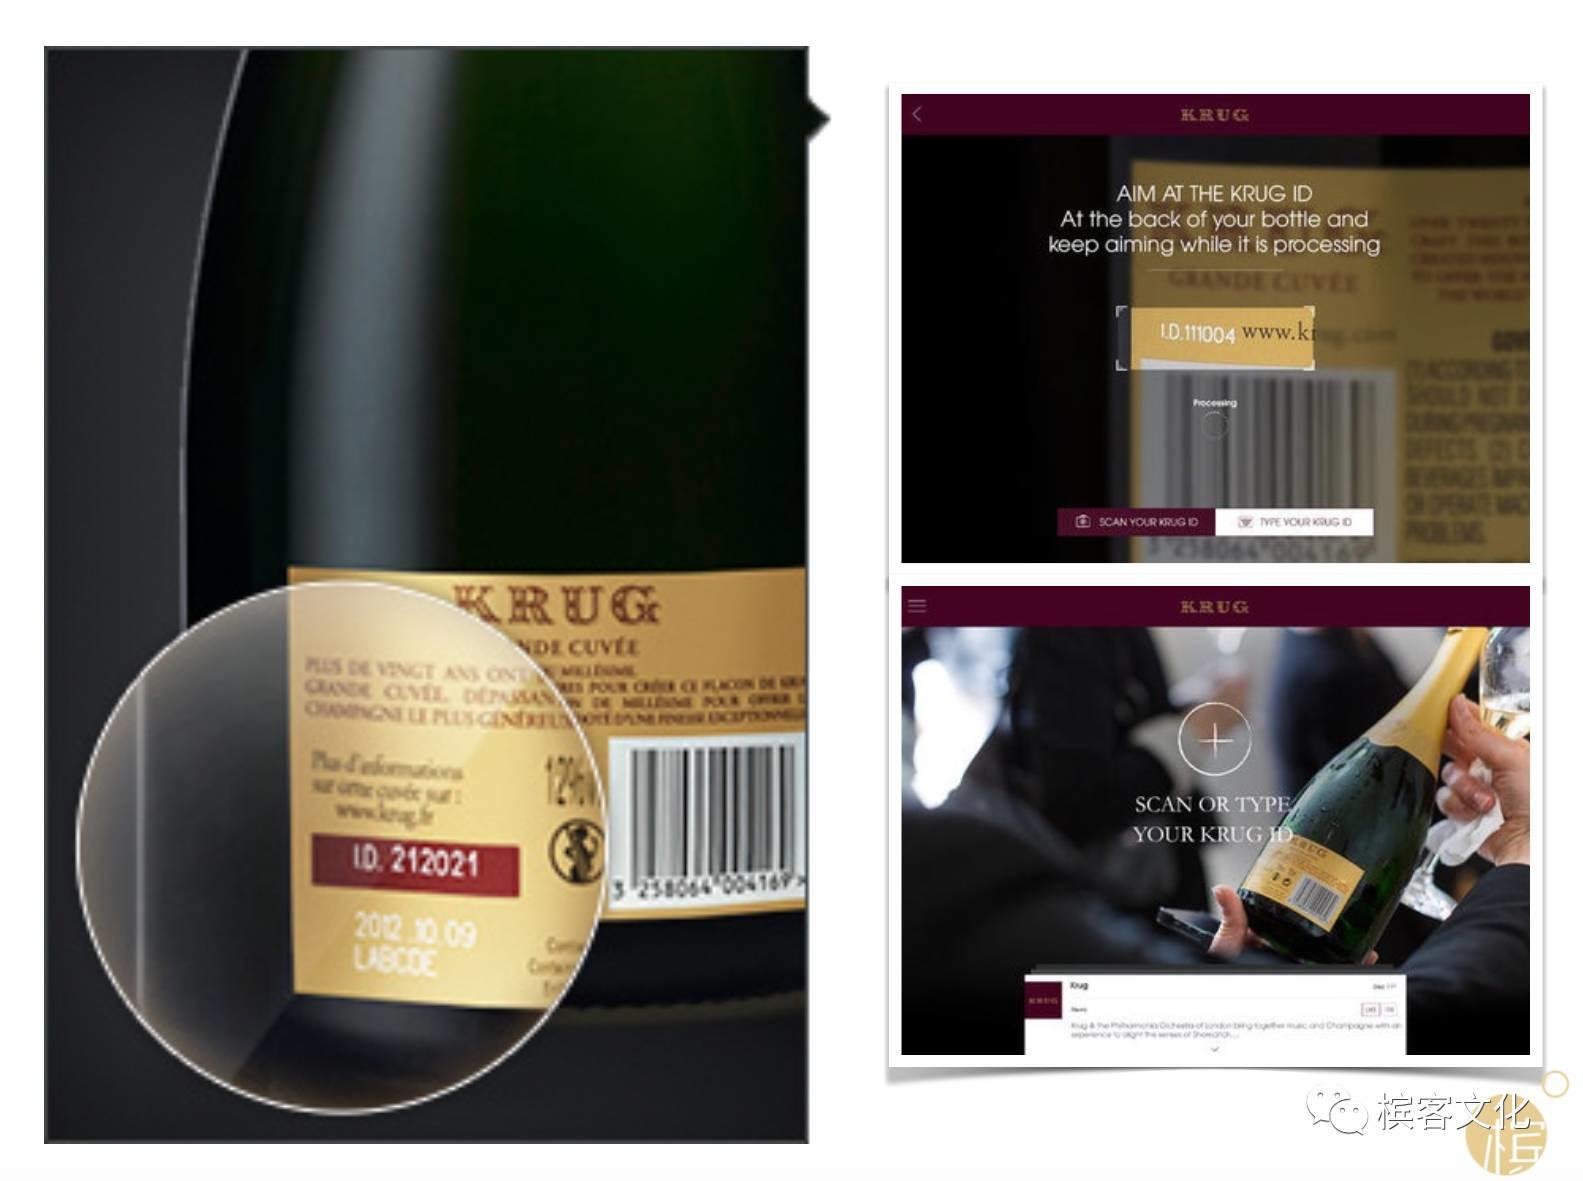 名庄解读 | Champagne KRUG 库克香槟